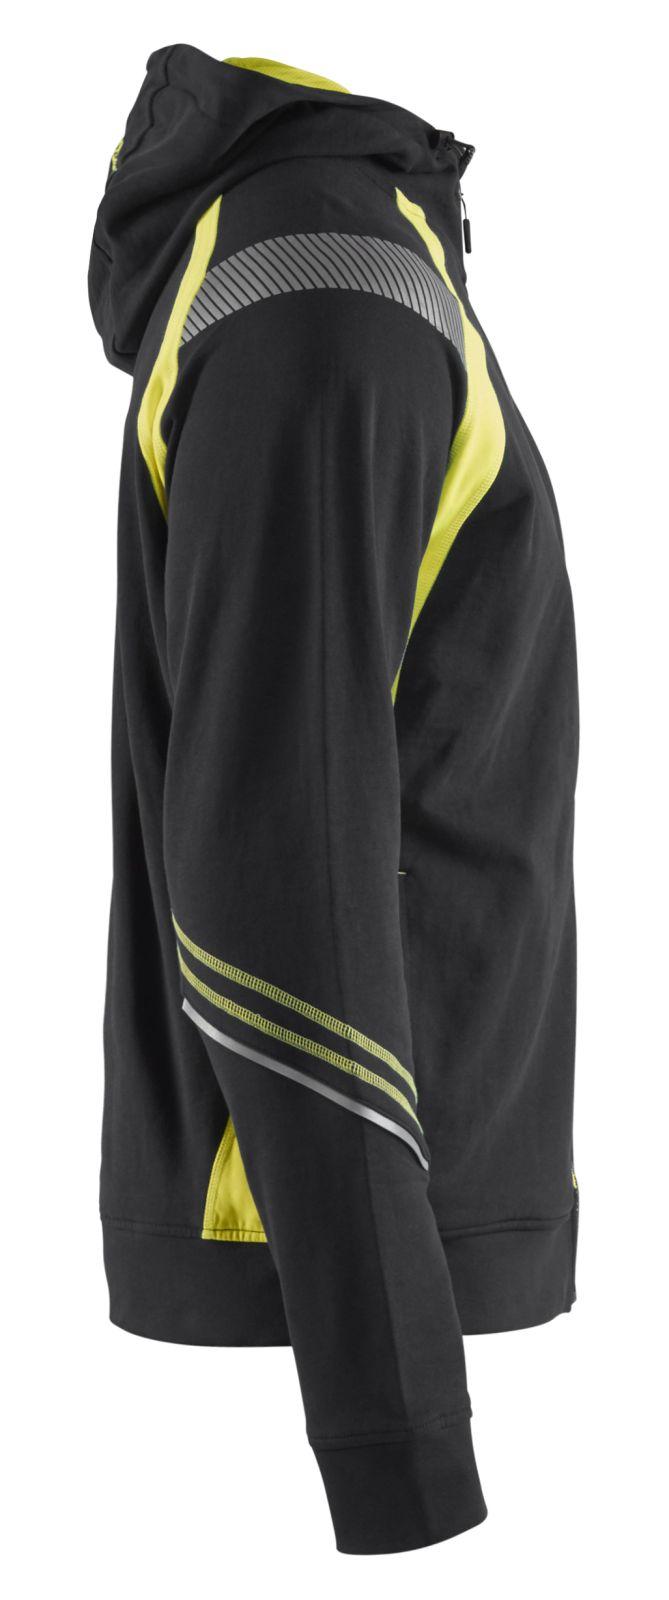 Blaklader Hooded sweatvesten 34331158 zwart-geel(9933)